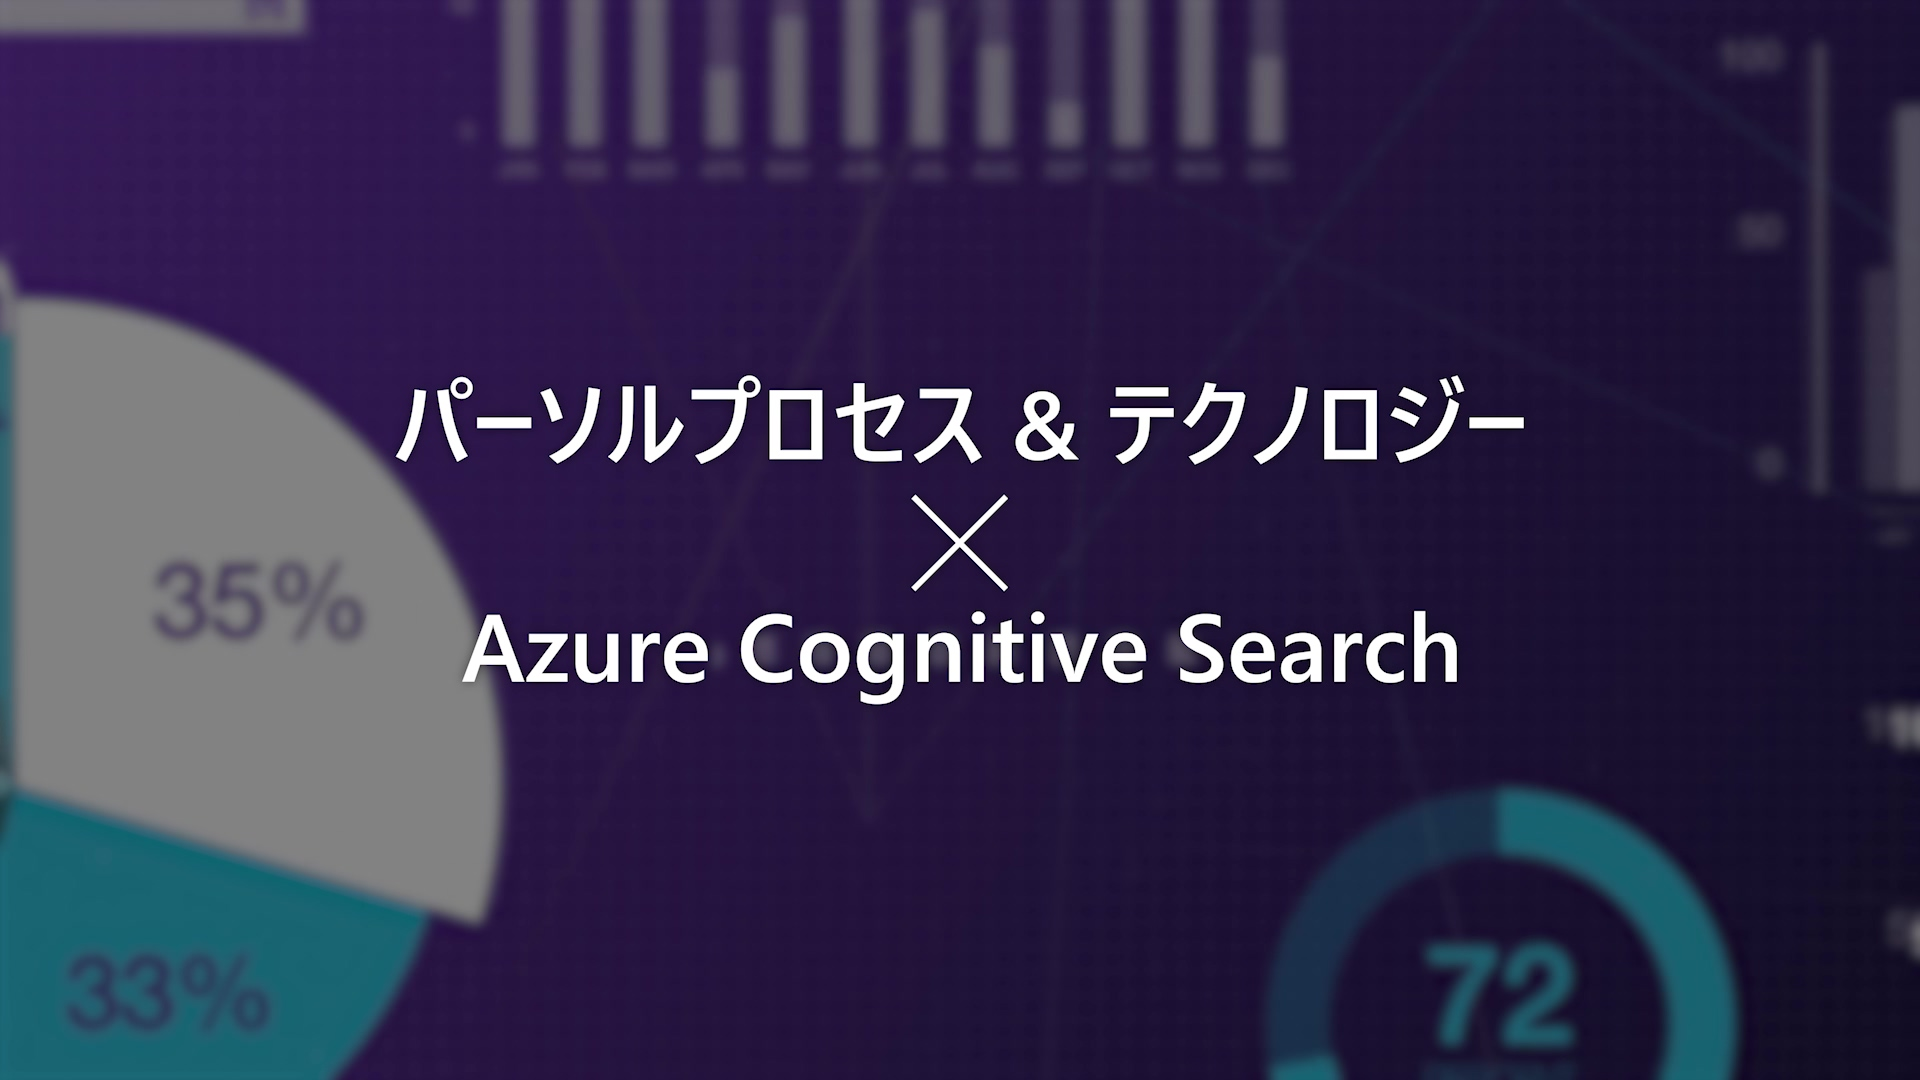 microsoft-azure-cognitive-search